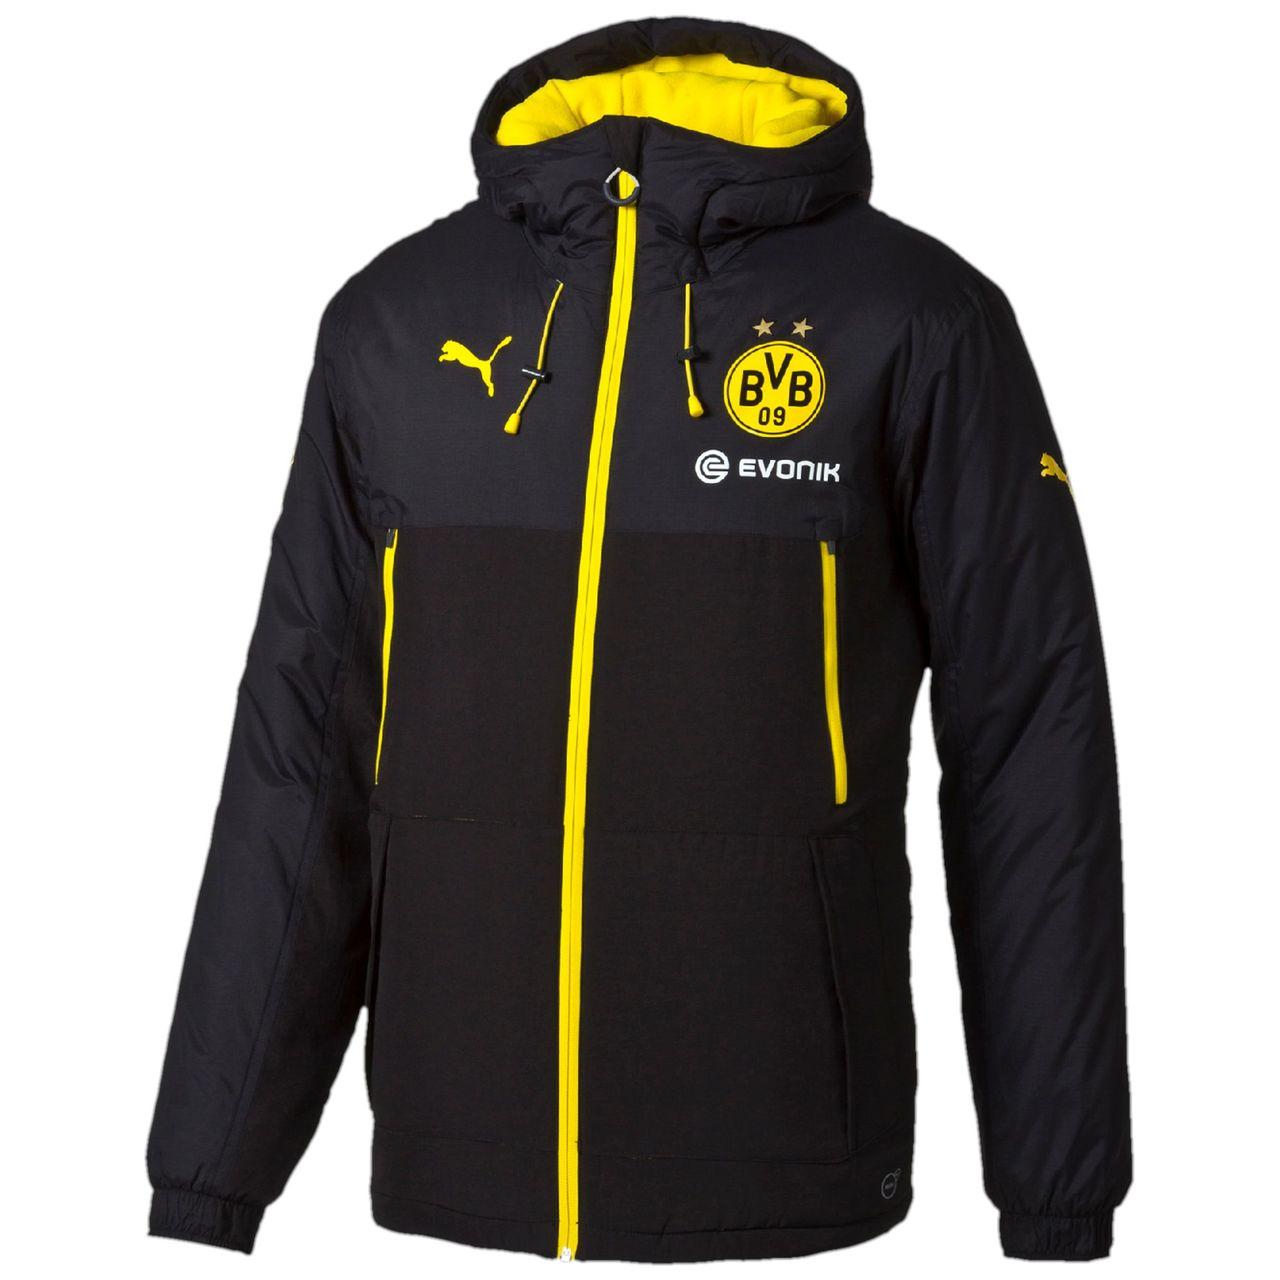 puma borussia dortmund bench jacket black cyber yellow equipment football shirt blog. Black Bedroom Furniture Sets. Home Design Ideas